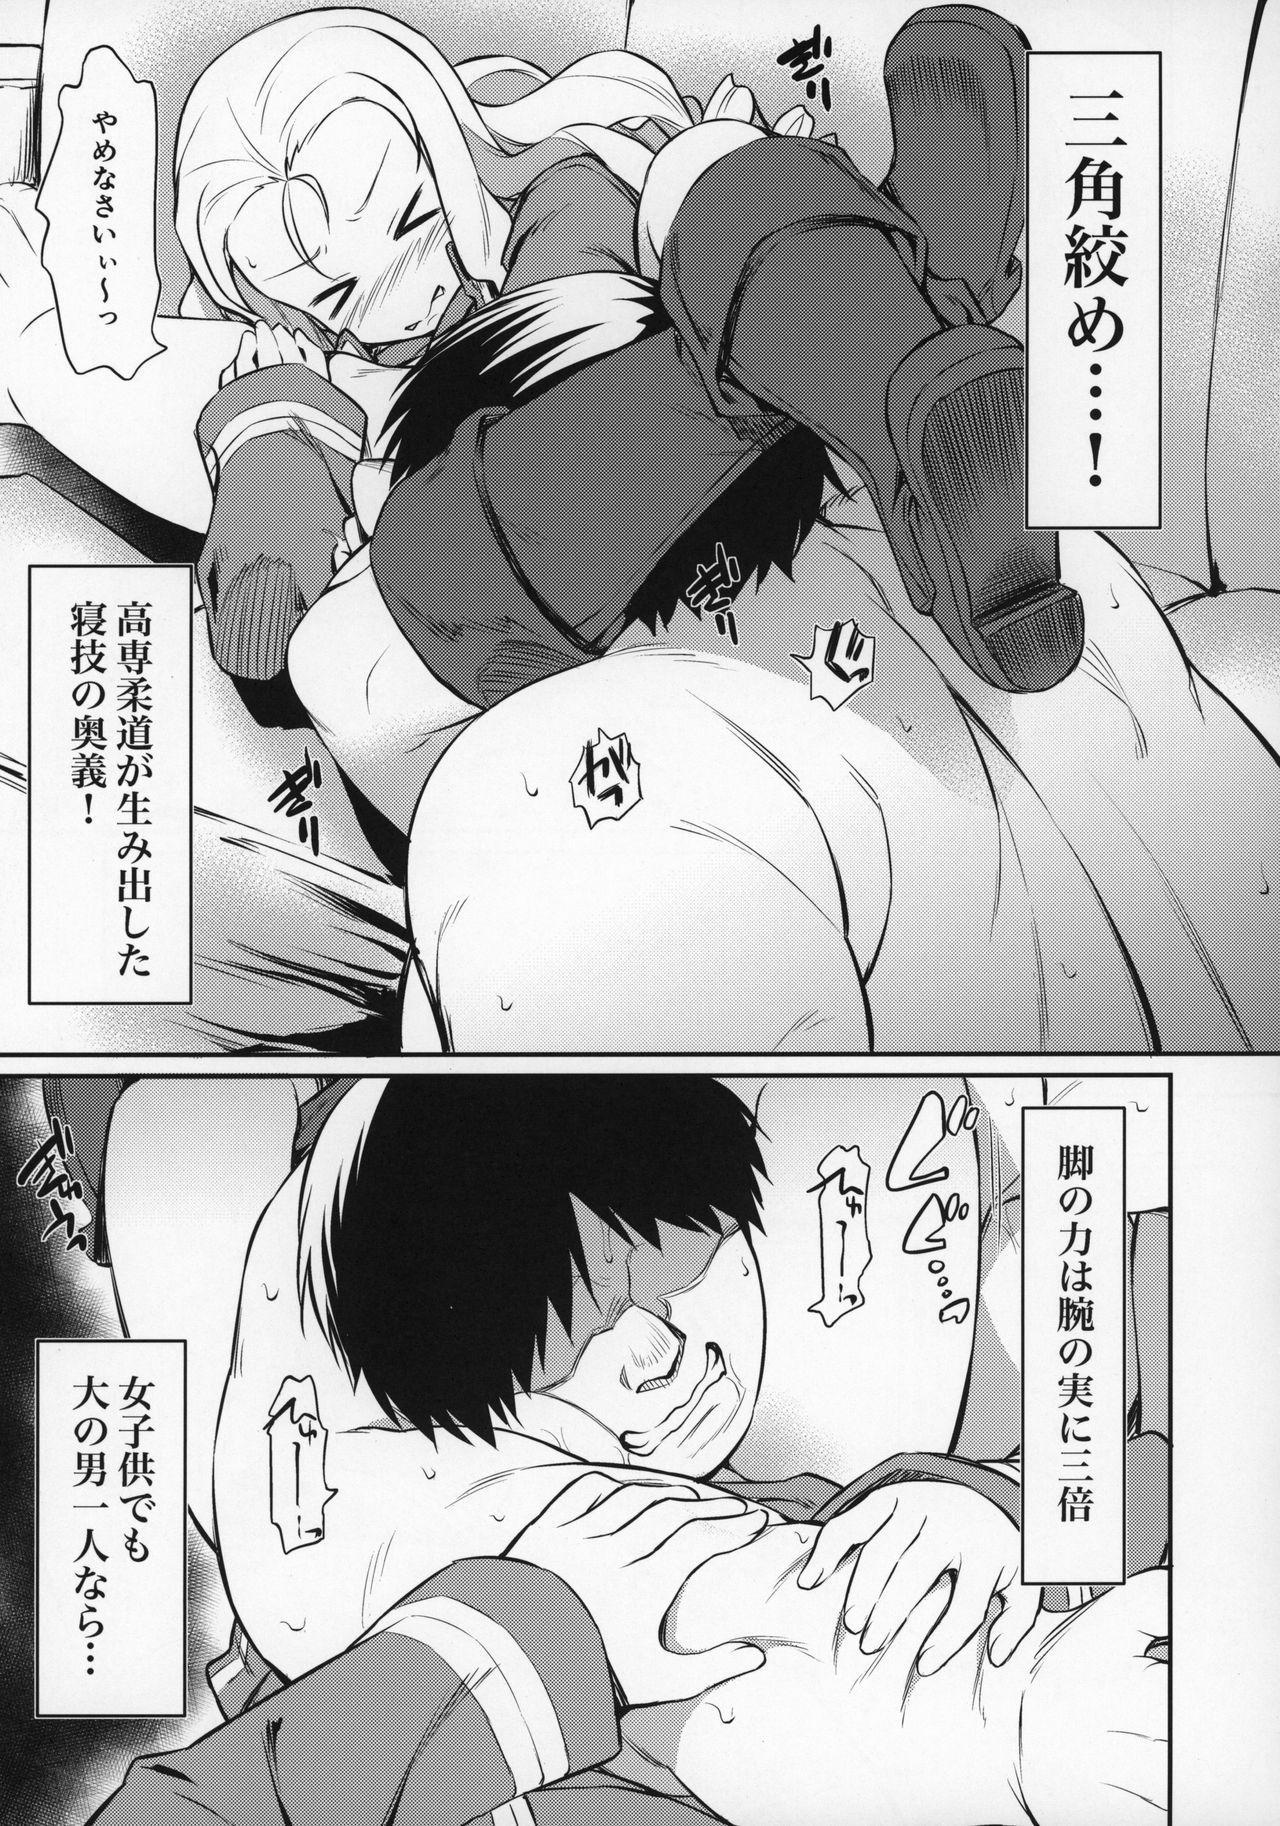 Marie-sama no Sankakujime 21